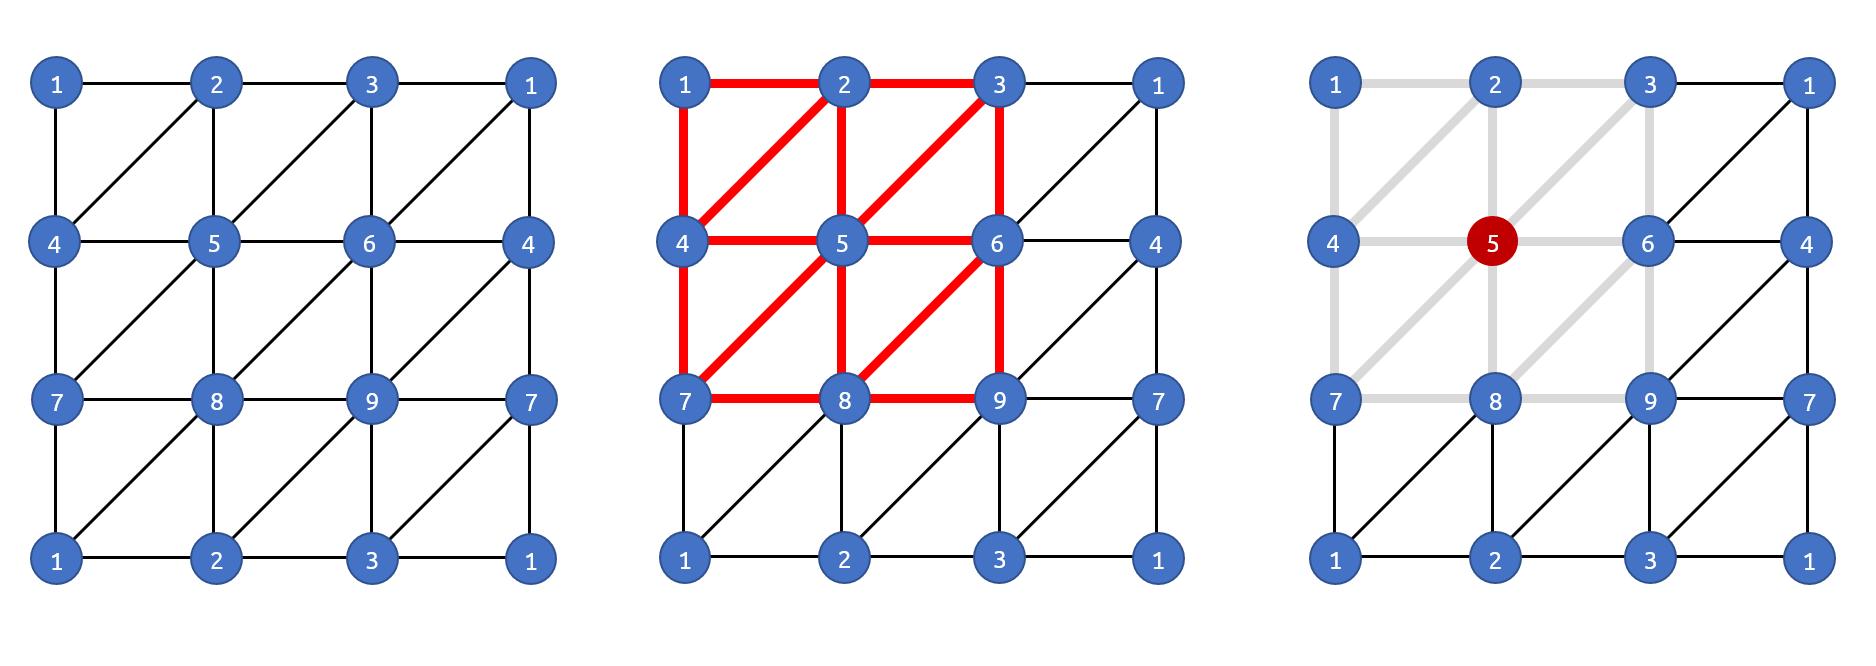 fundamental group of torus using triangulation